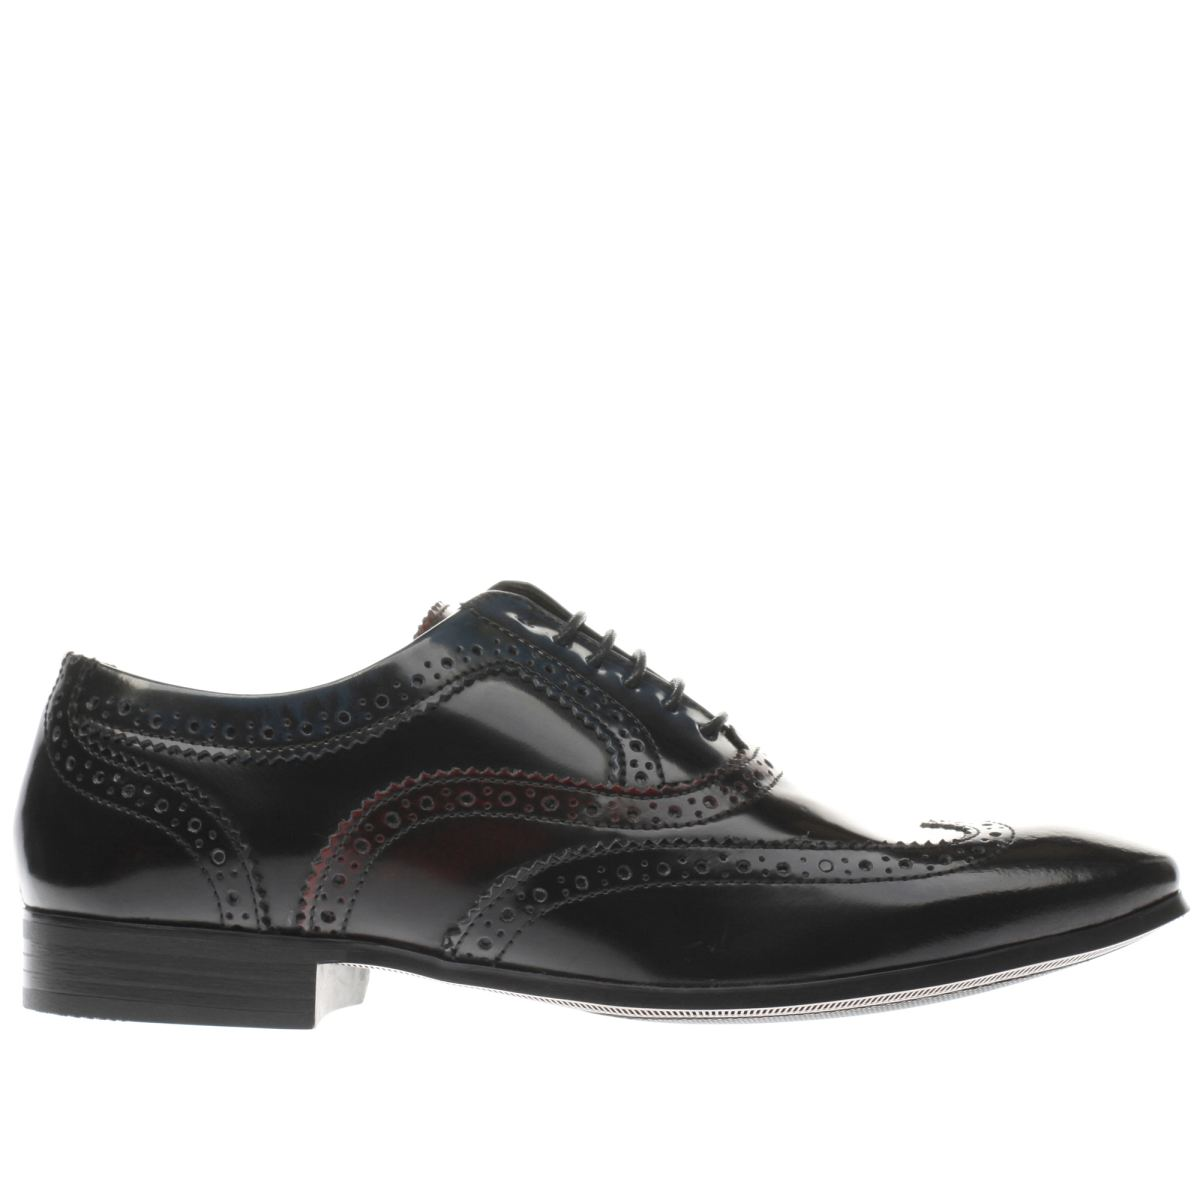 ikon black & navy gipson oxford shoes